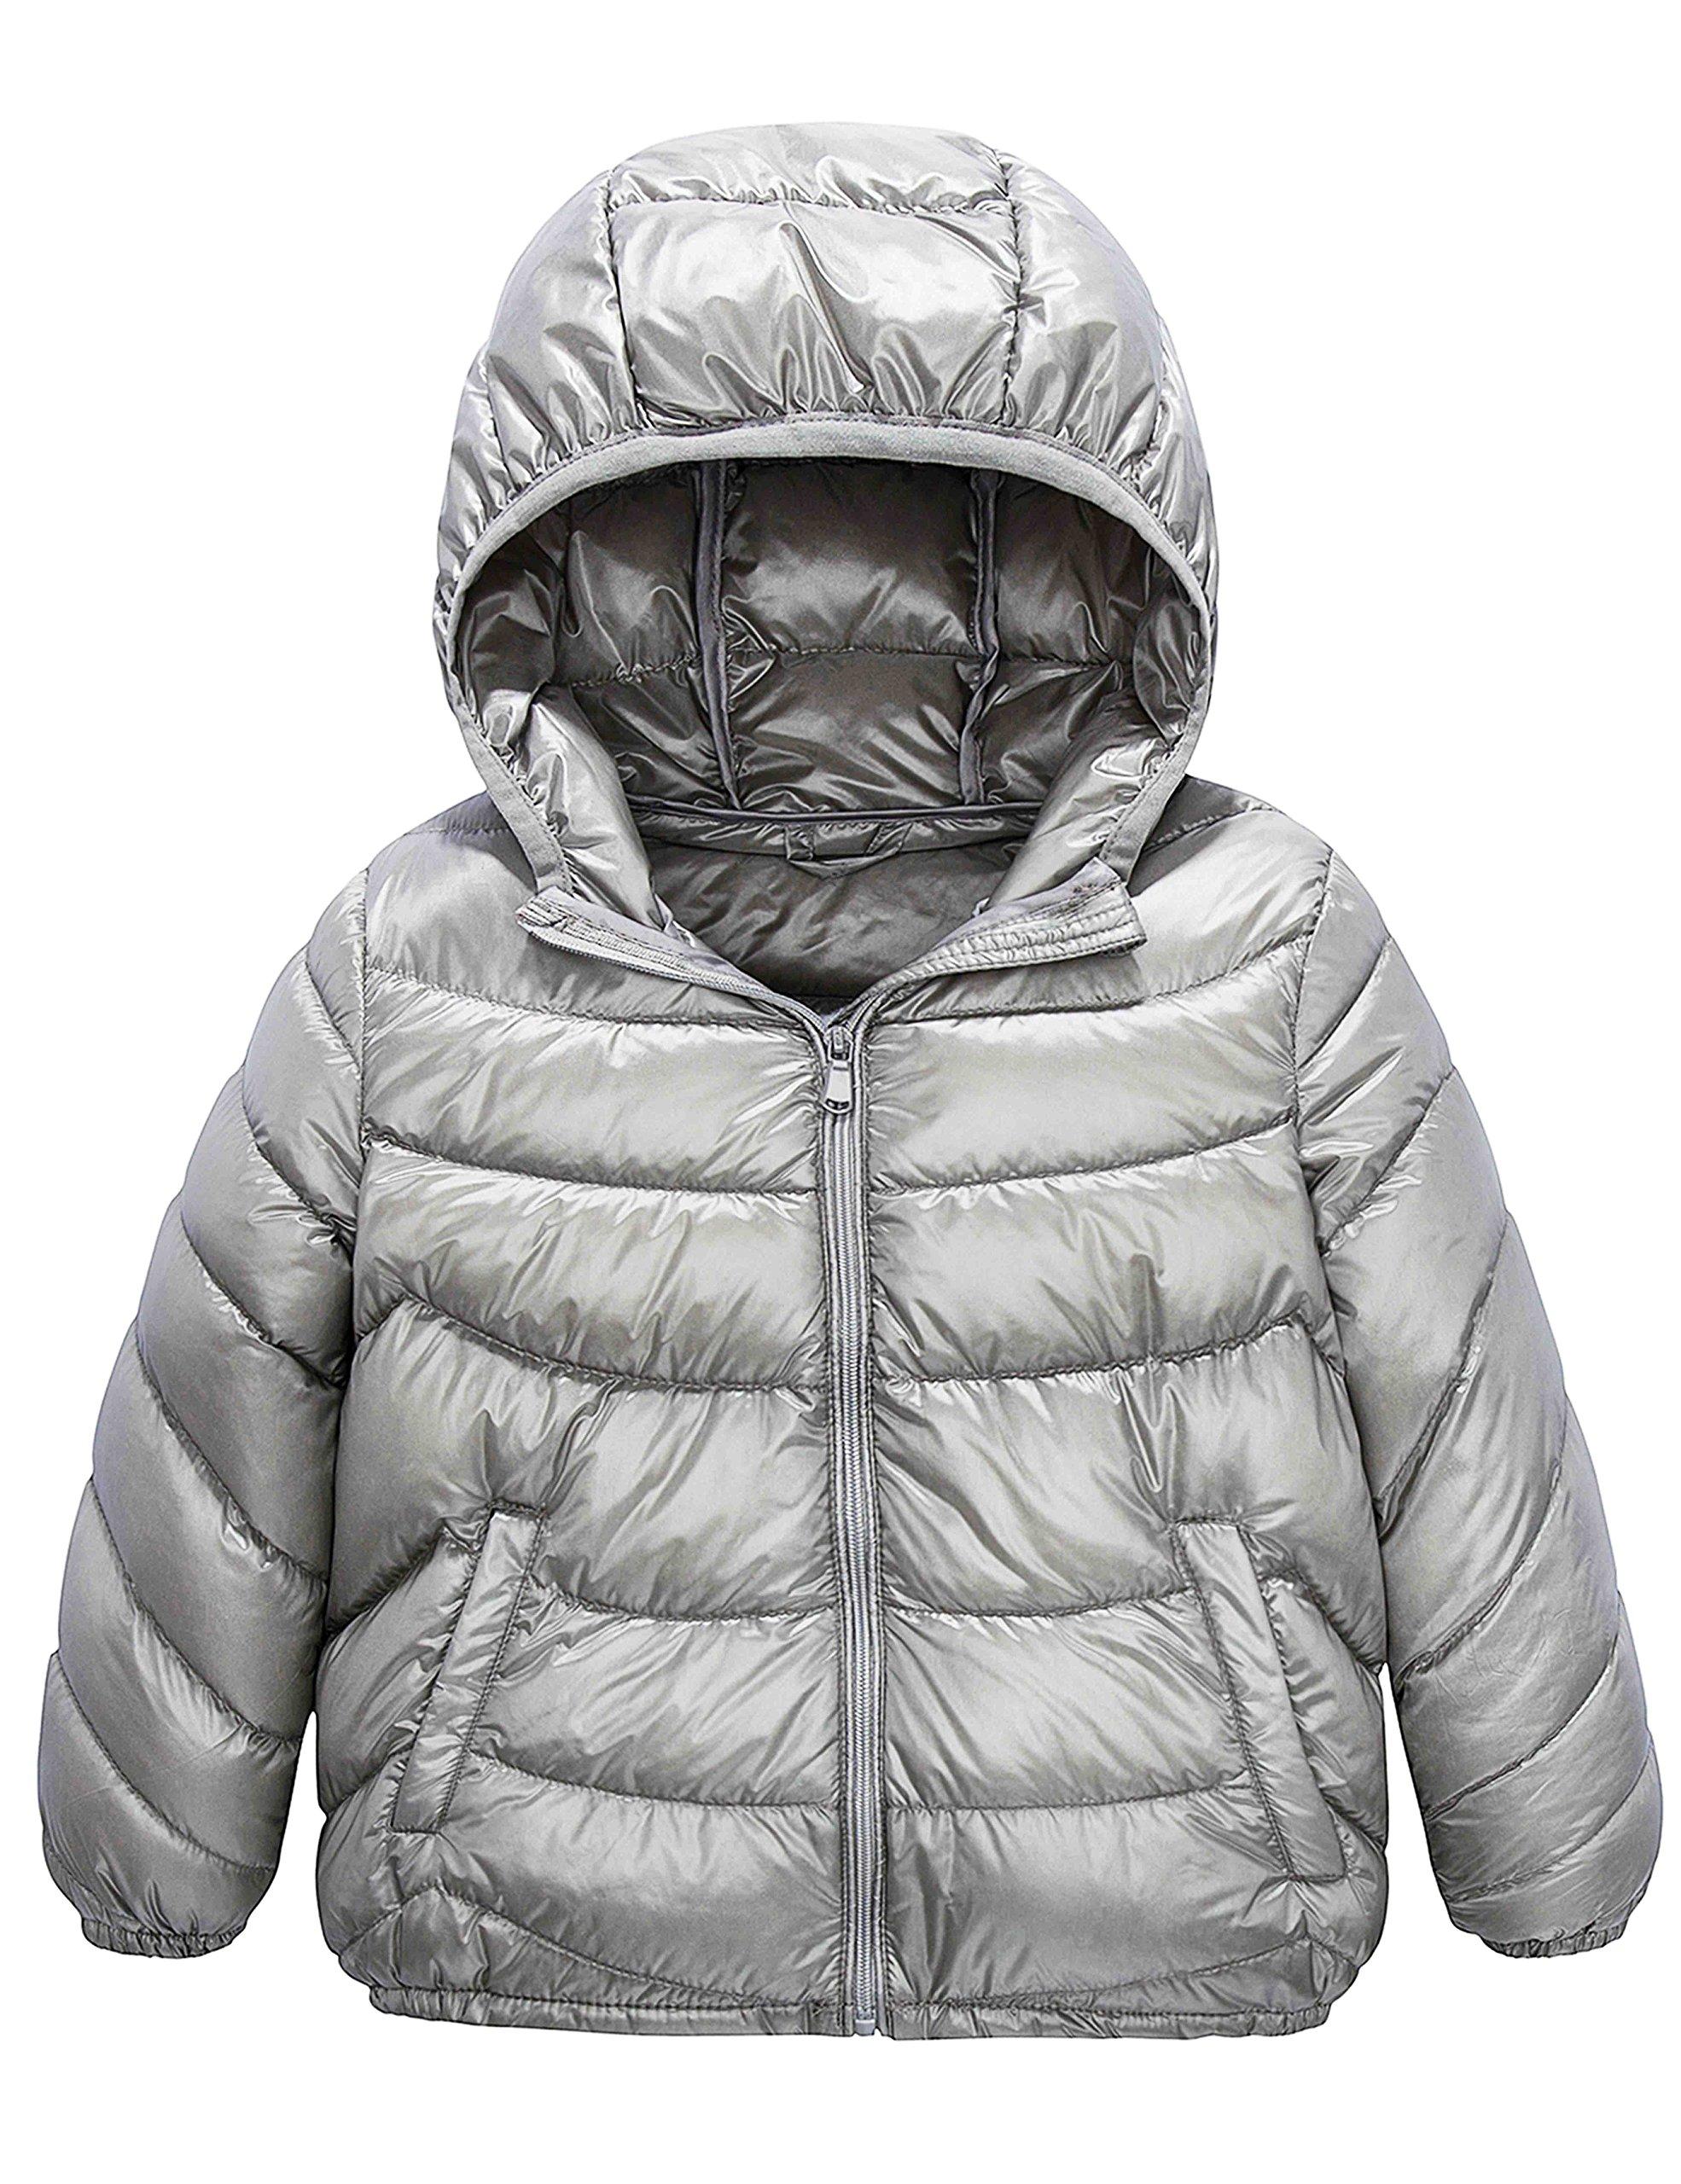 Lightweight Hooded Puffer Winter Jacket IKALI Kids Packable Down Coat